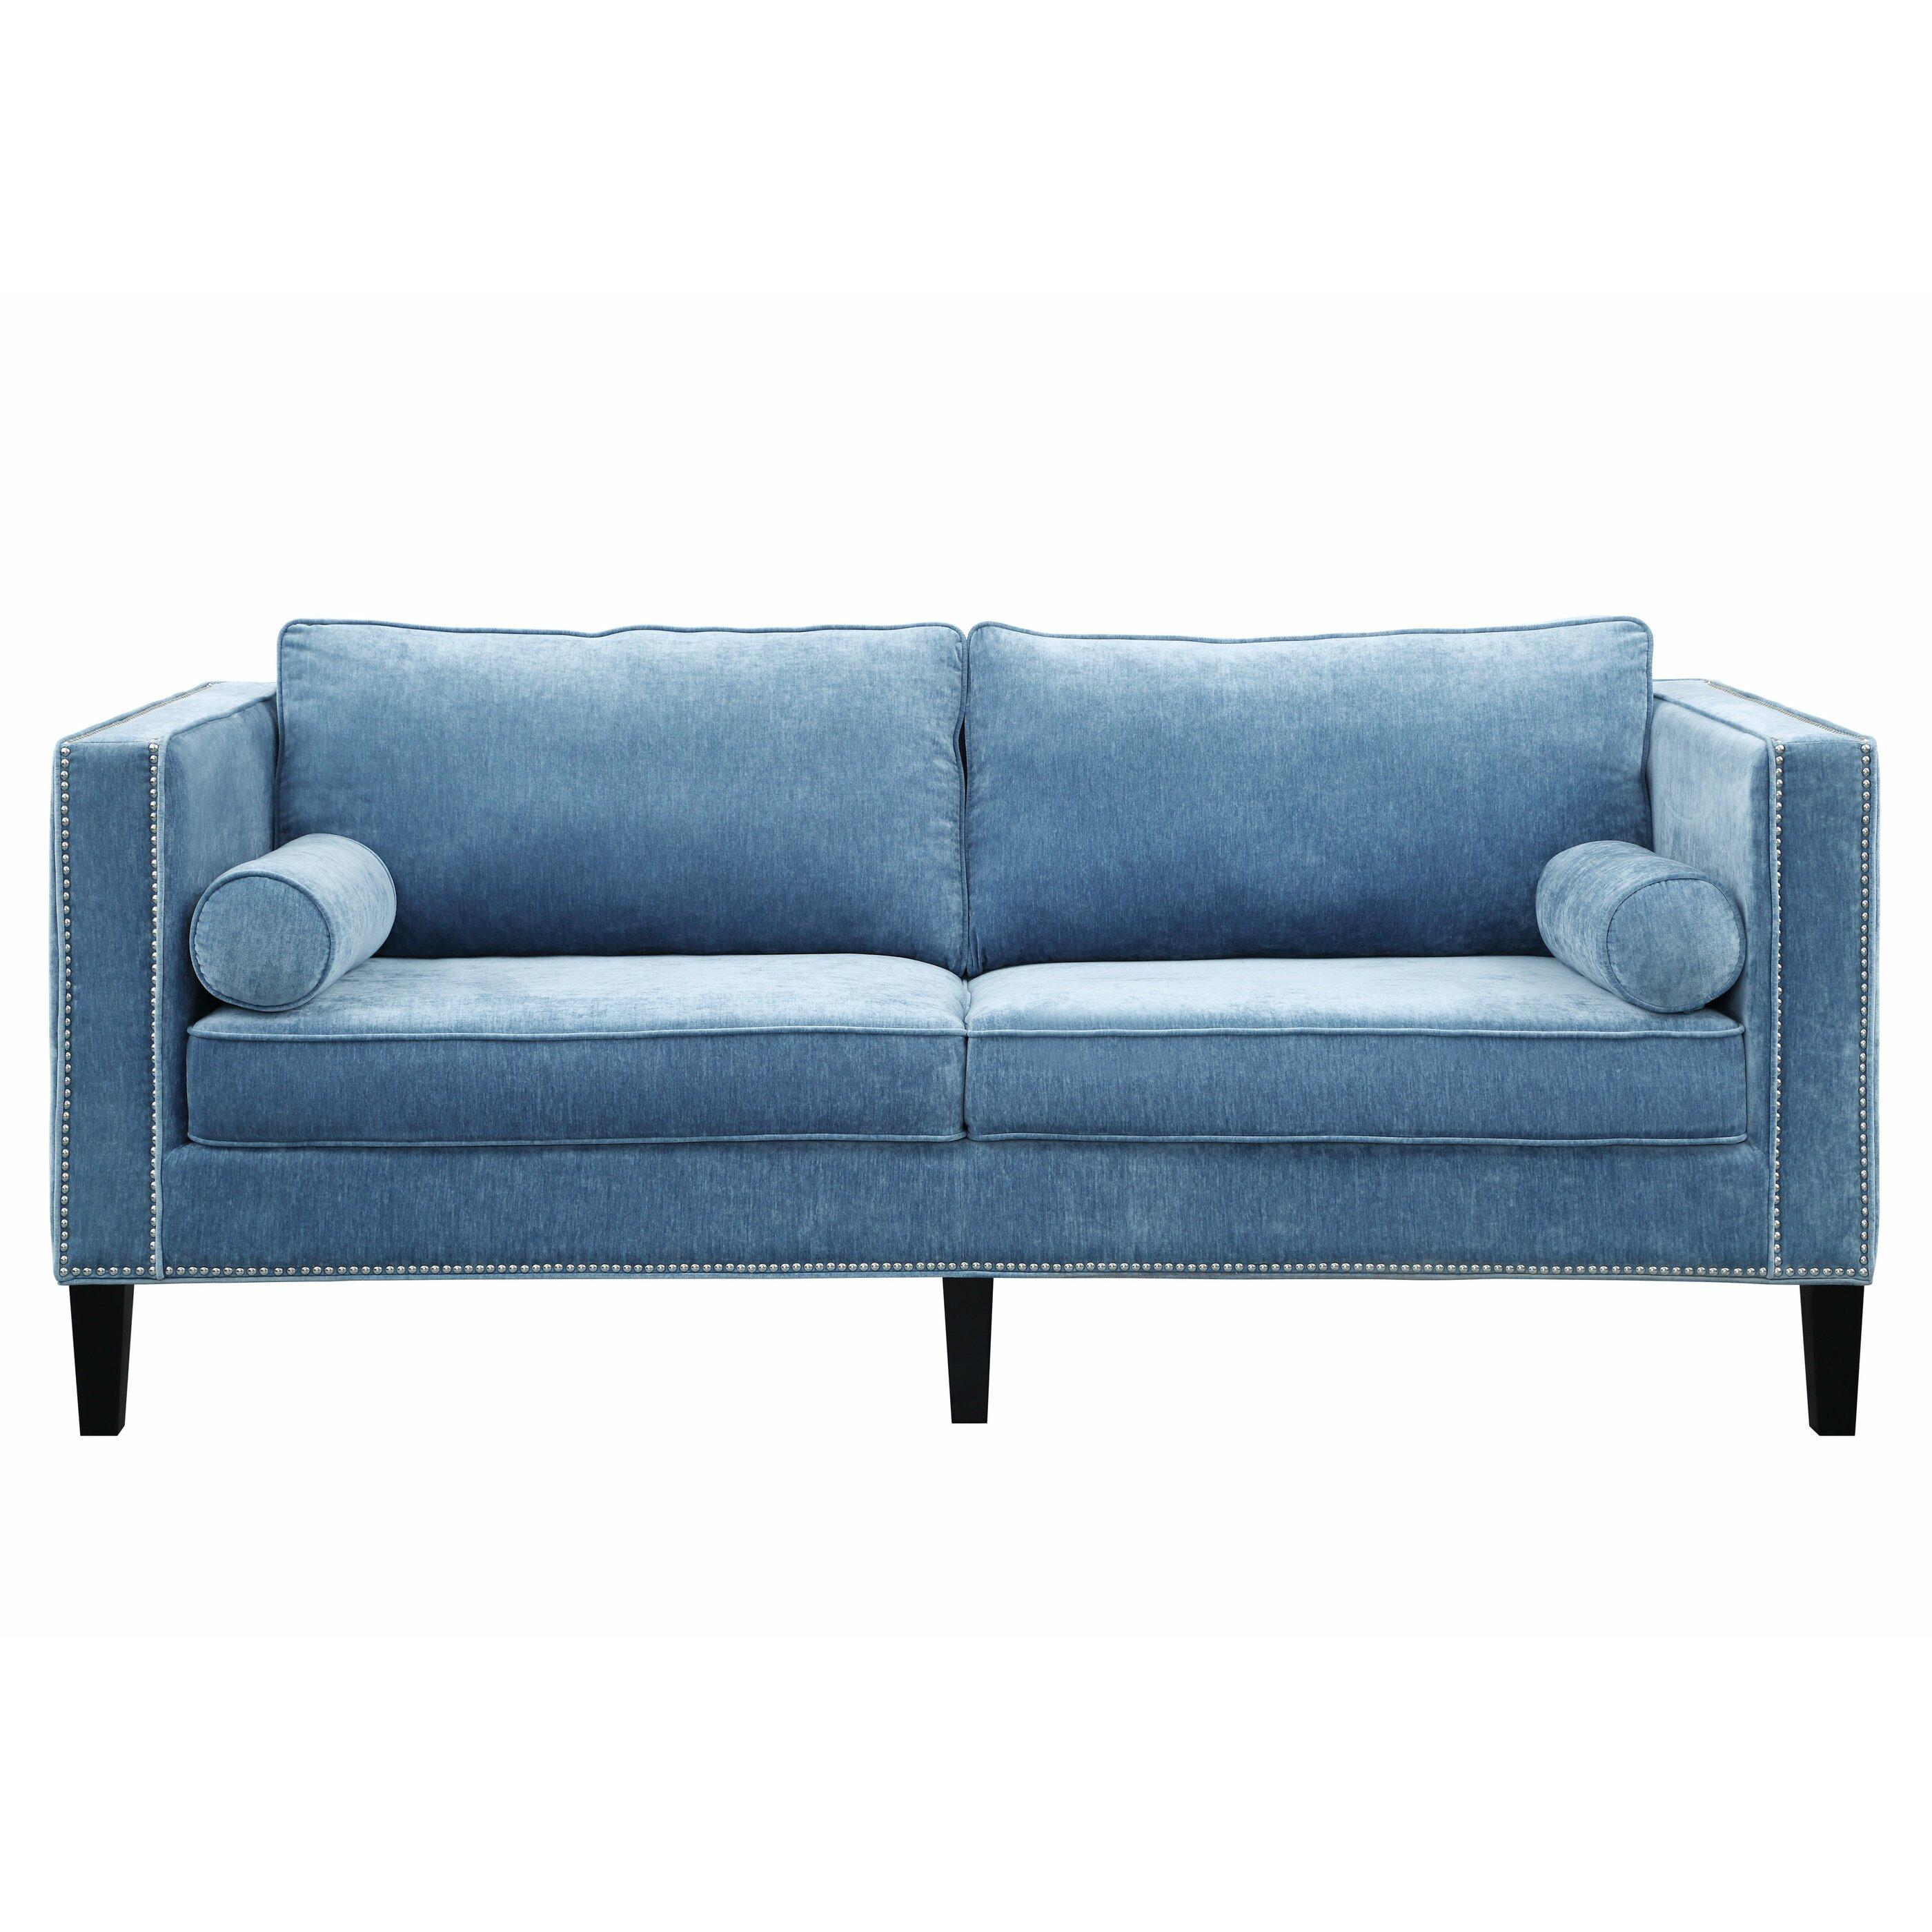 Tov cooper sofa reviews wayfair for I furniture reviews